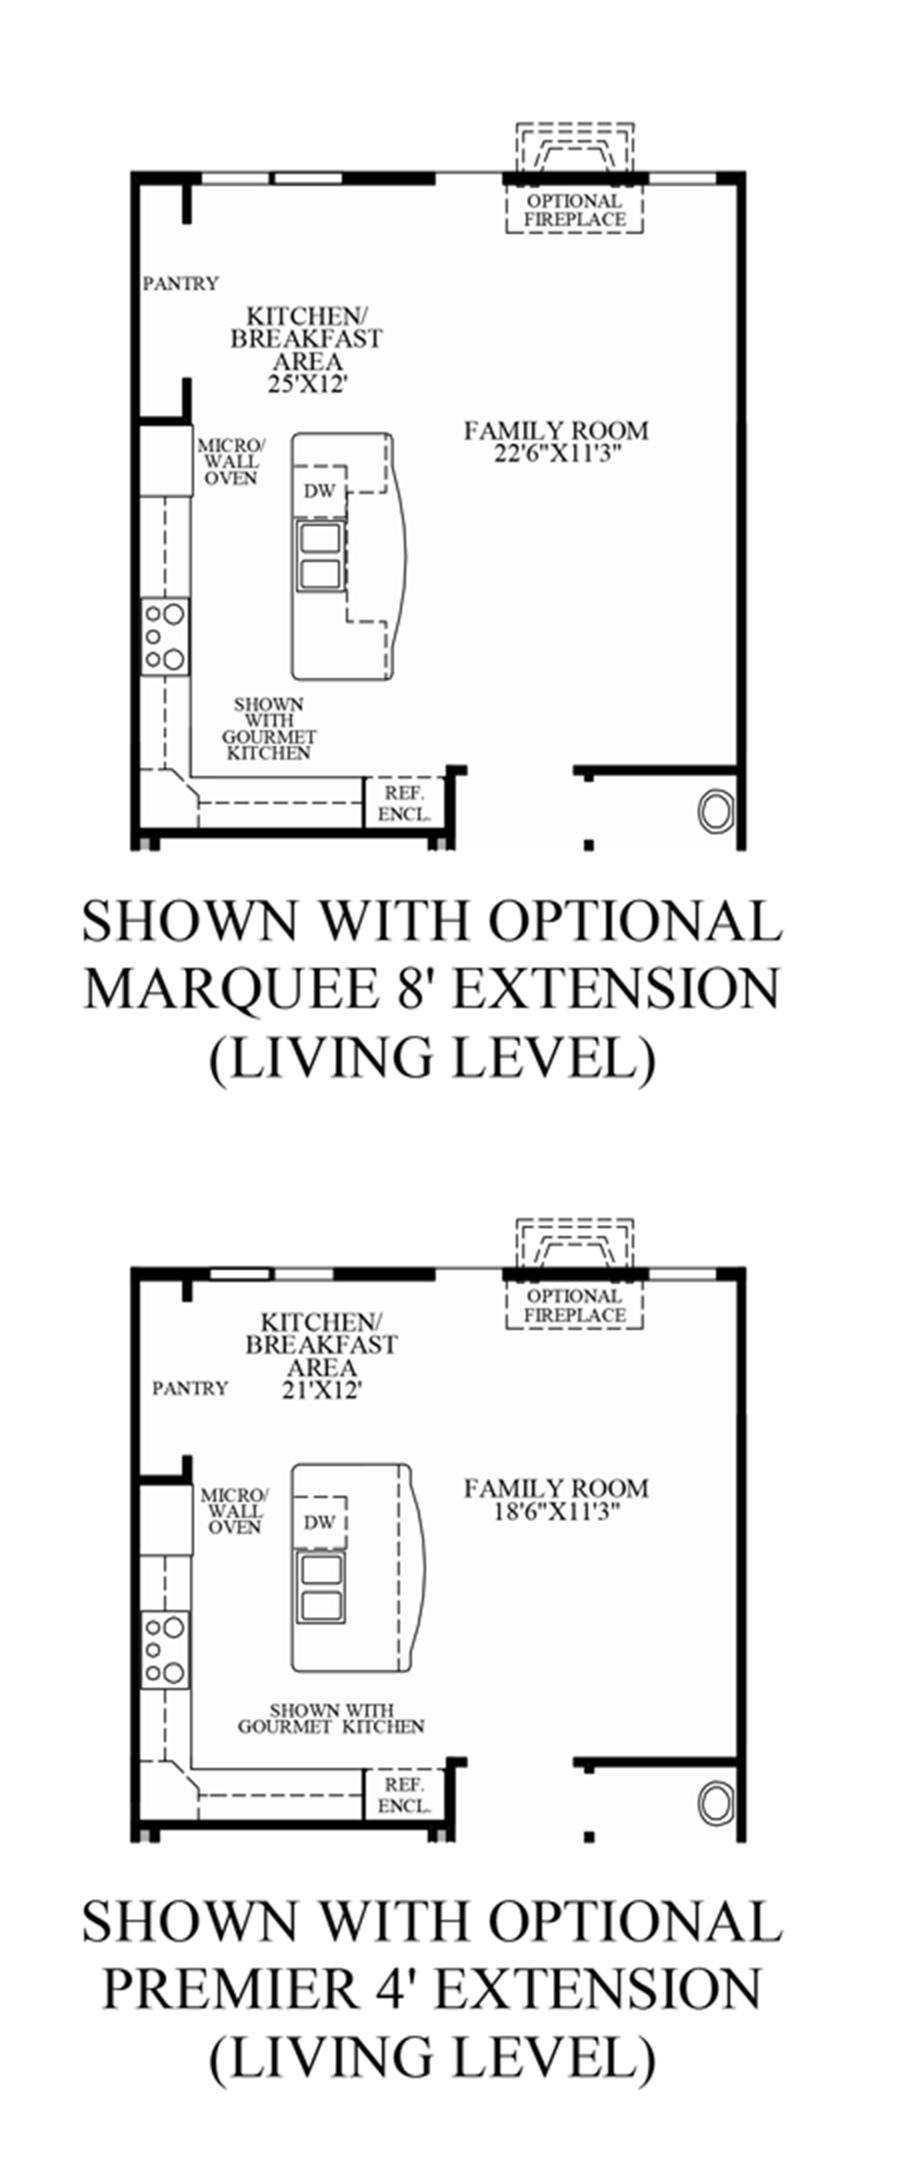 Optional Living Level Extensions (Lower Level Entry) Floor Plan